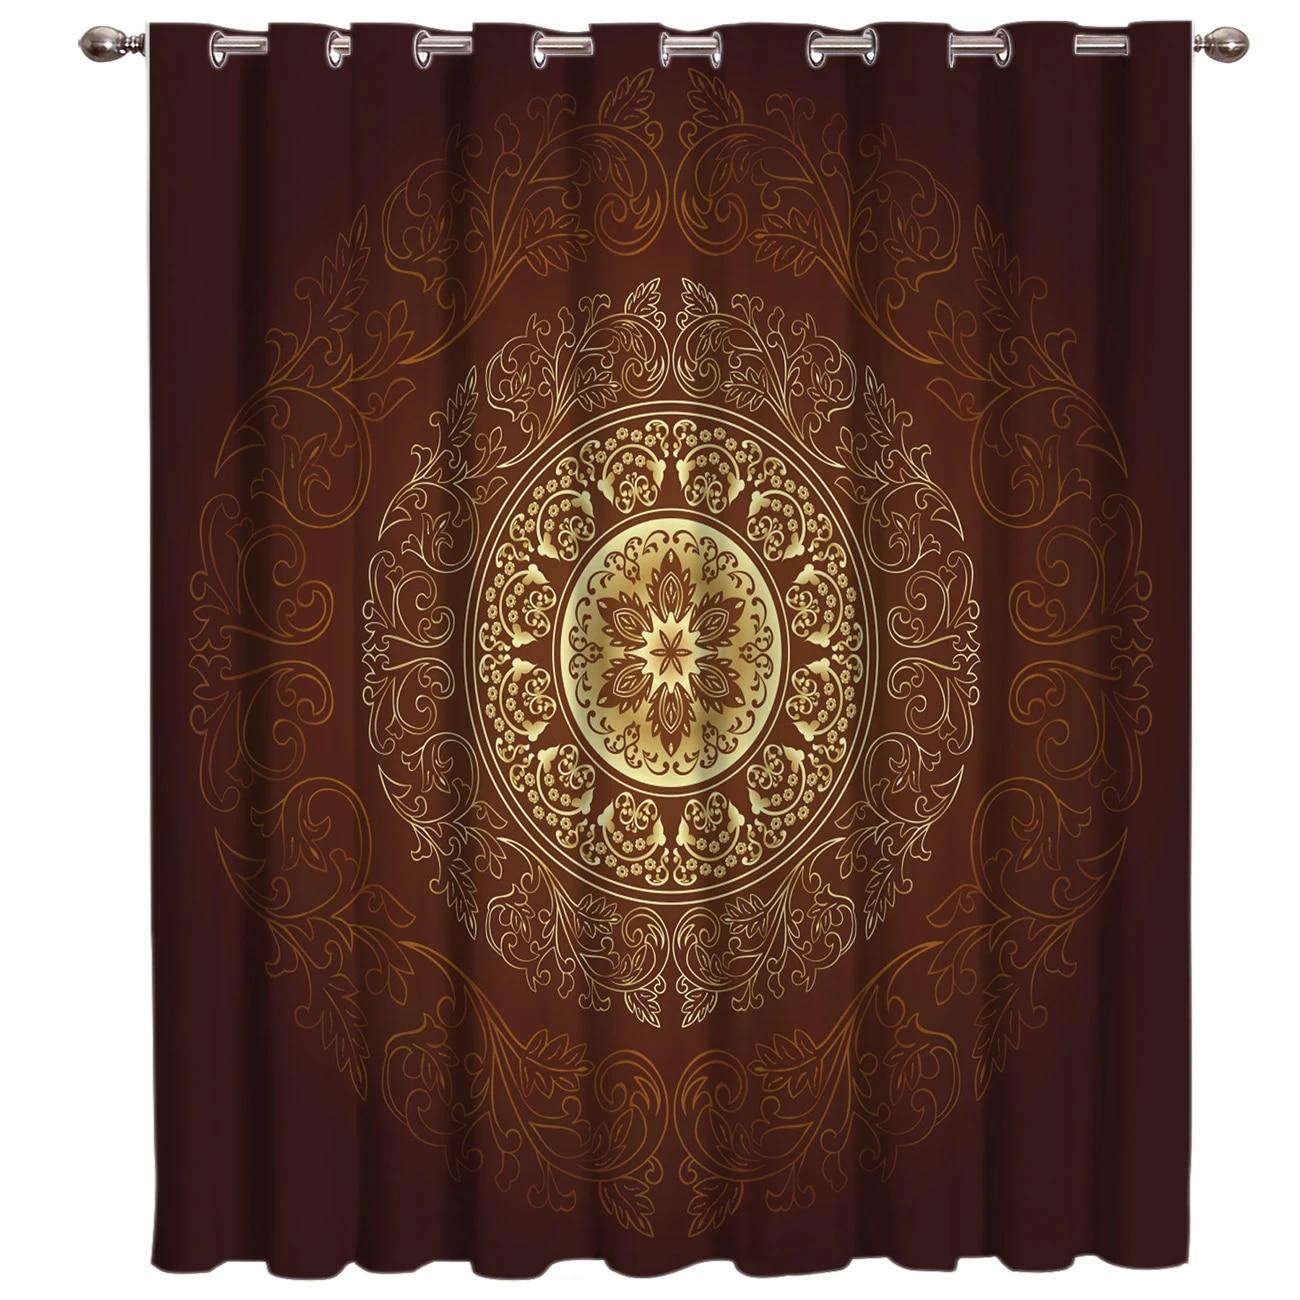 retro arab window treatments curtains valance living room curtain rod bedroom curtains kitchen fabric indoor decor print